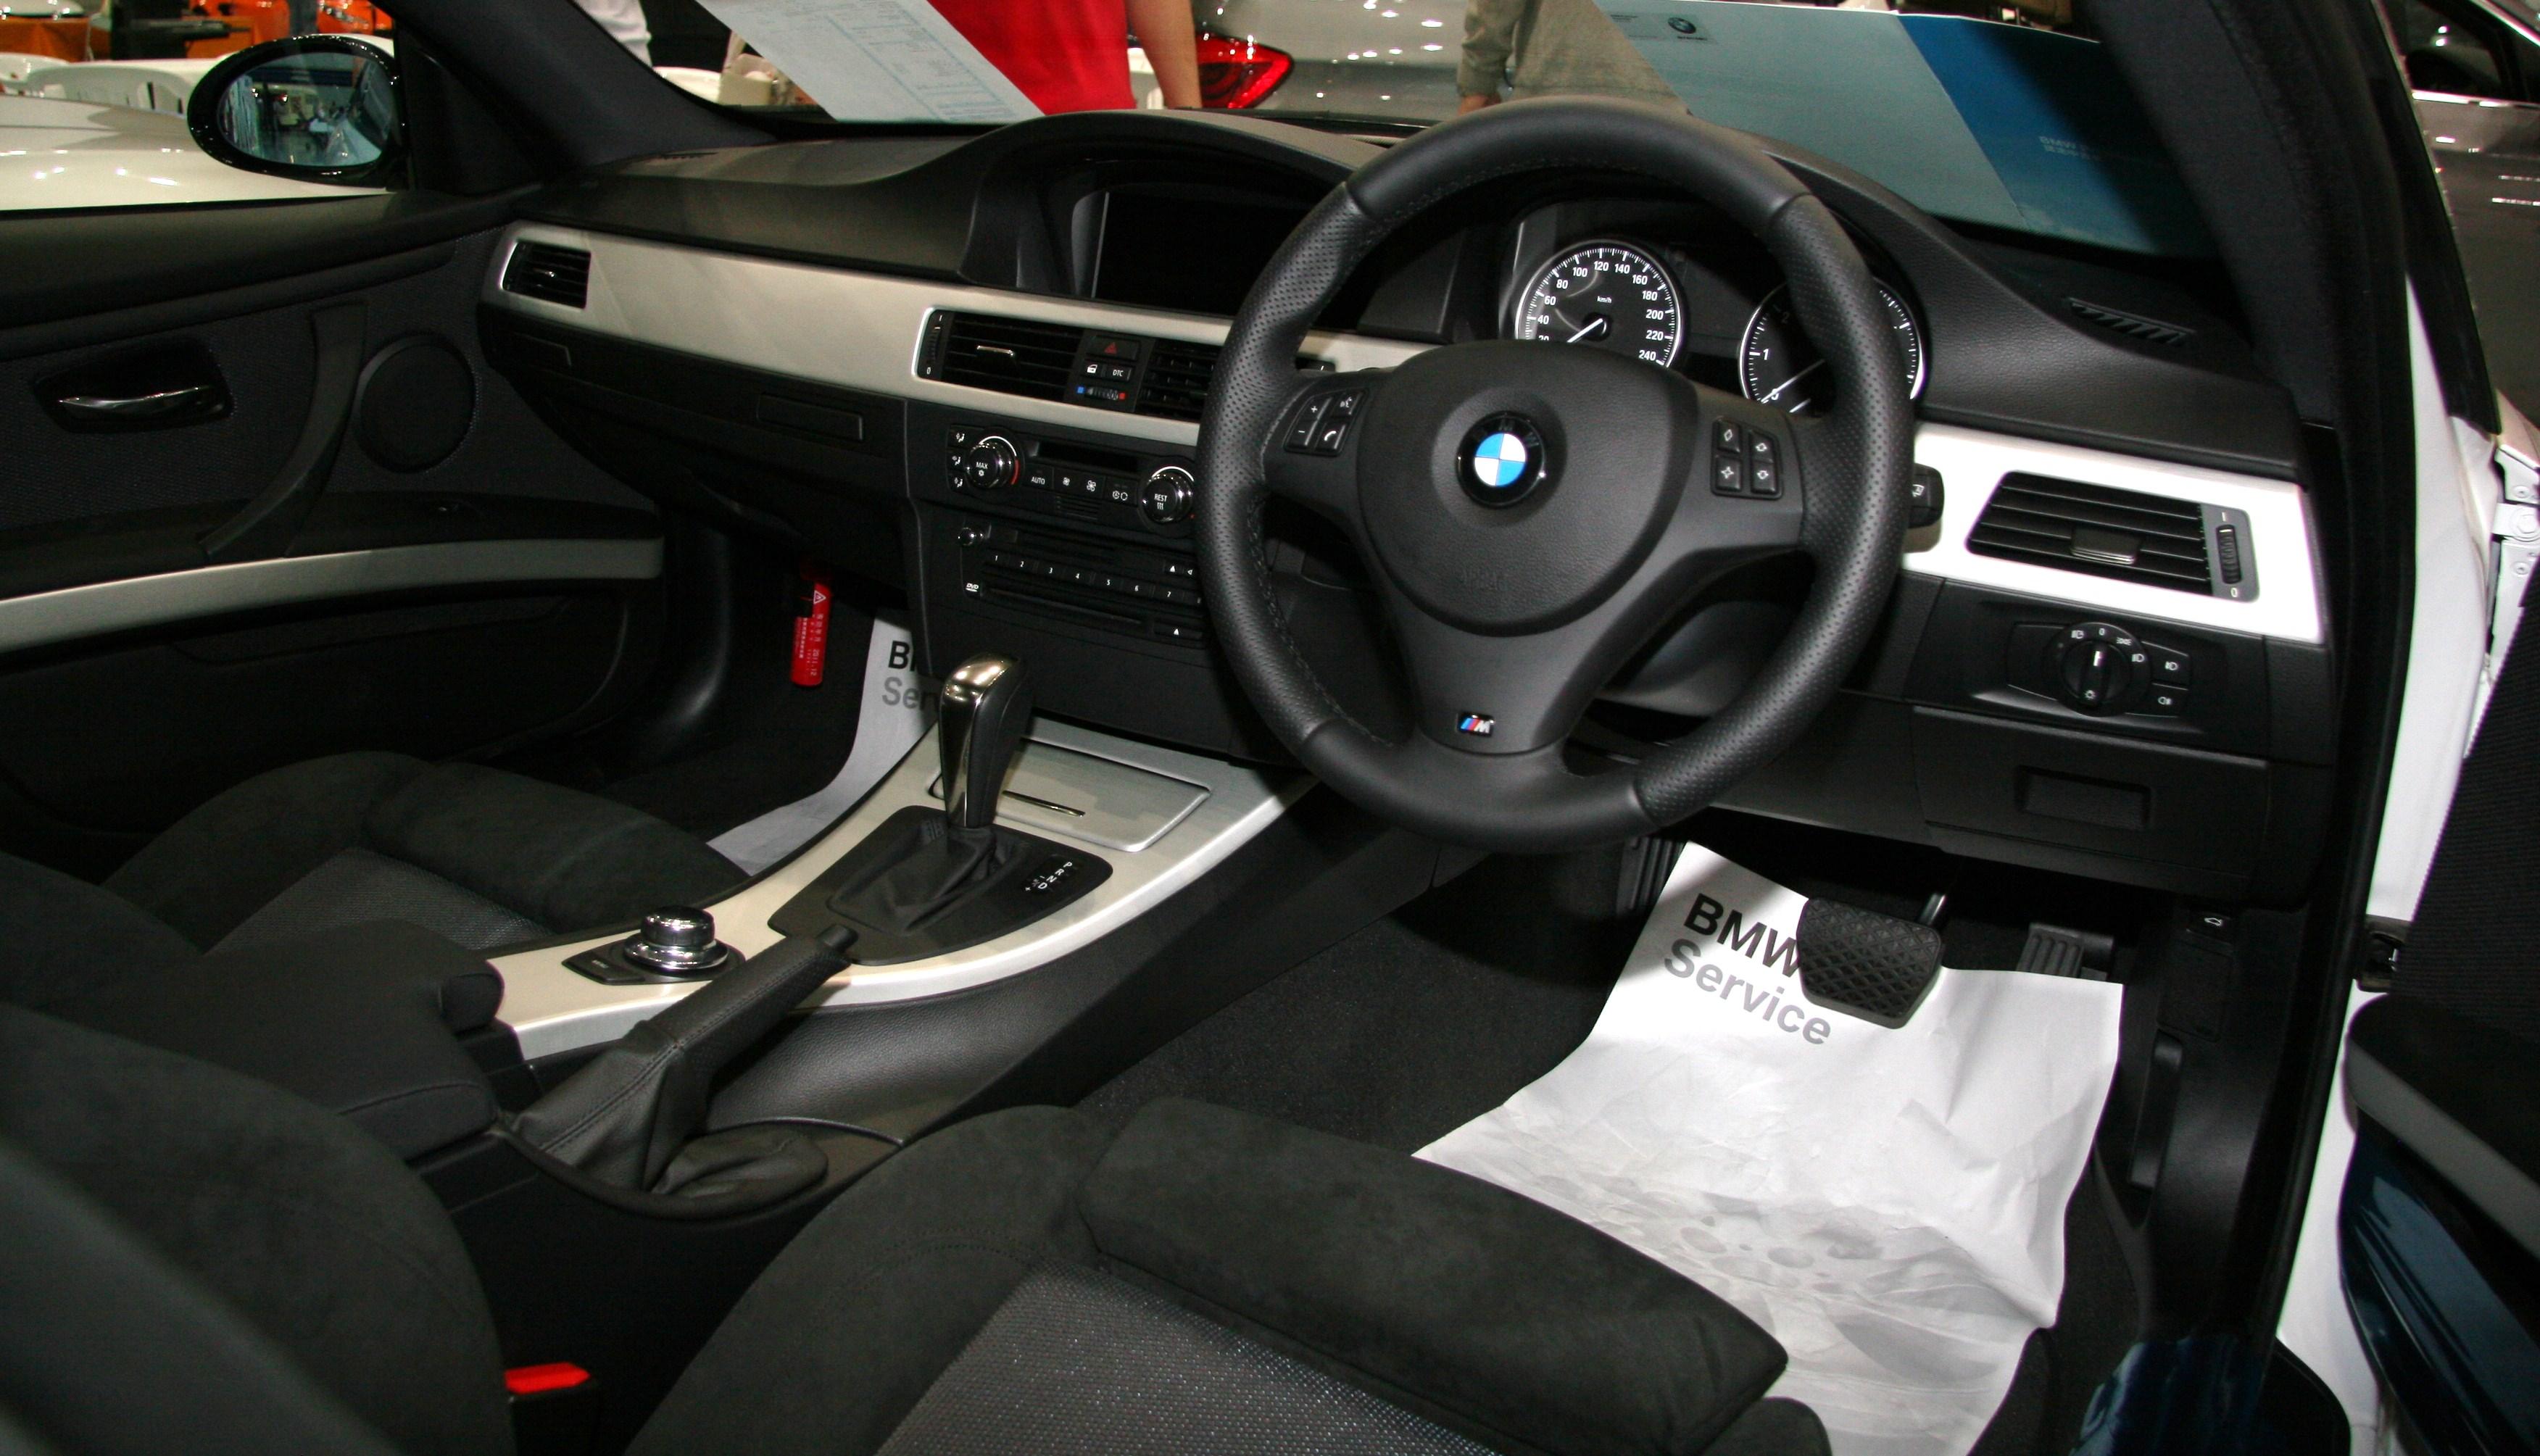 FileBMW 320i Coupe Interior